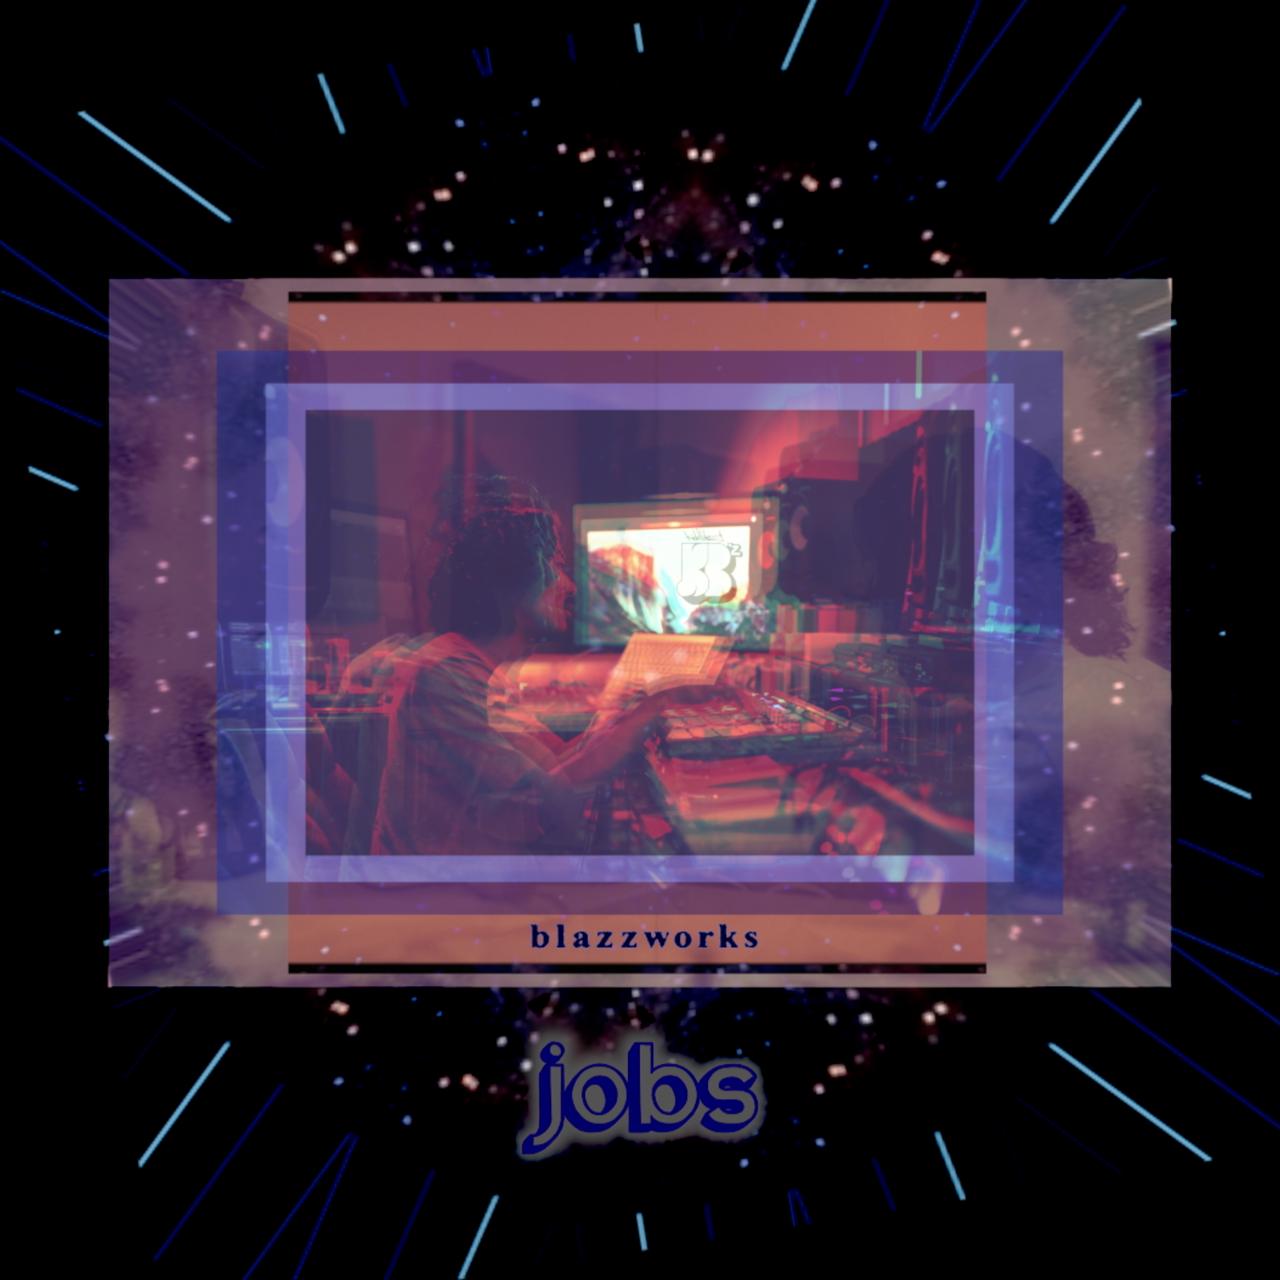 jobs / kiddblazz (Sound Track,Chill Music,Non Beat) MIX CD